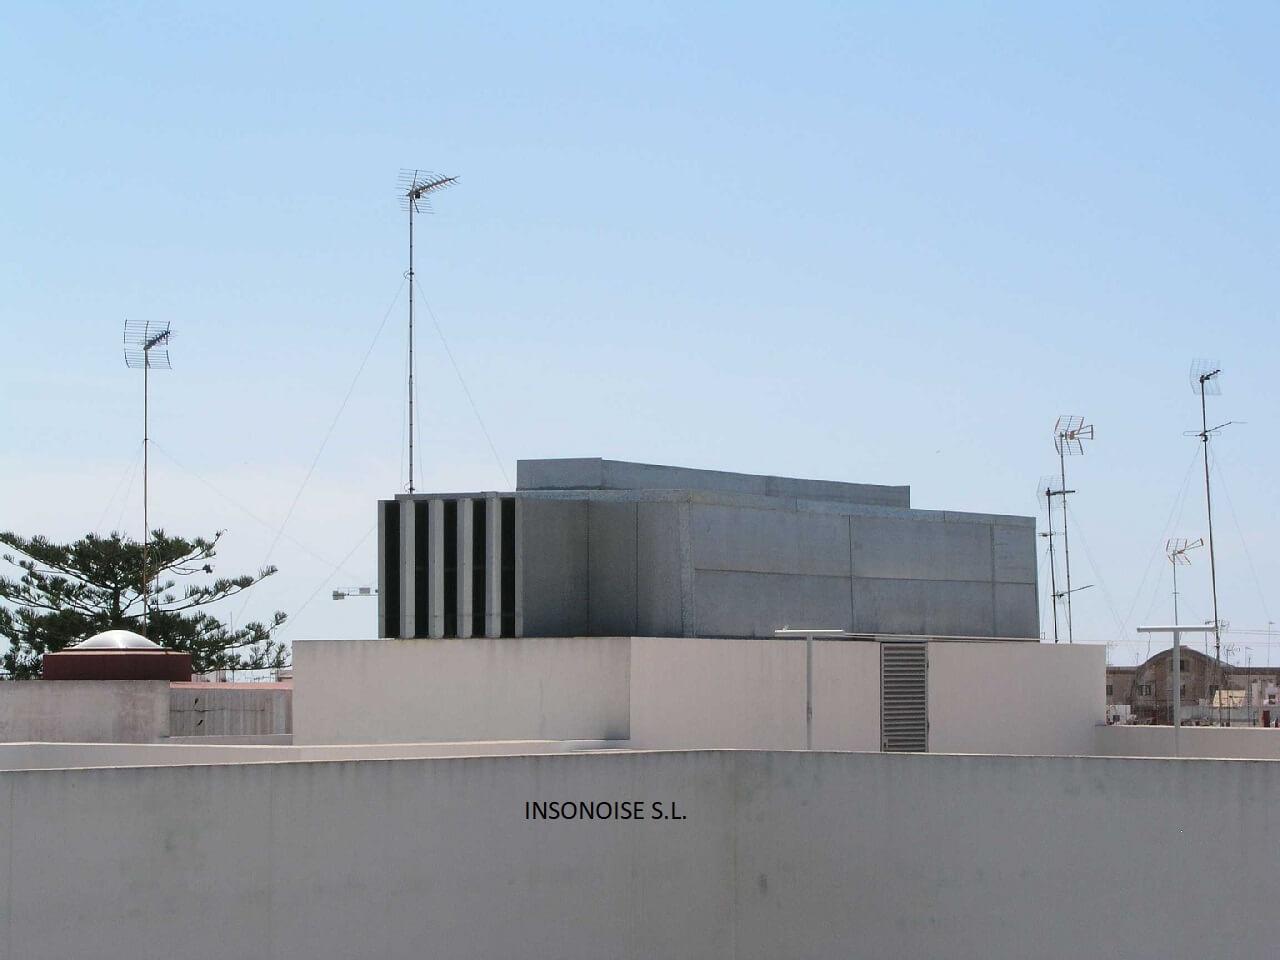 Reforma de Aislamiento Acústico en Cádiz